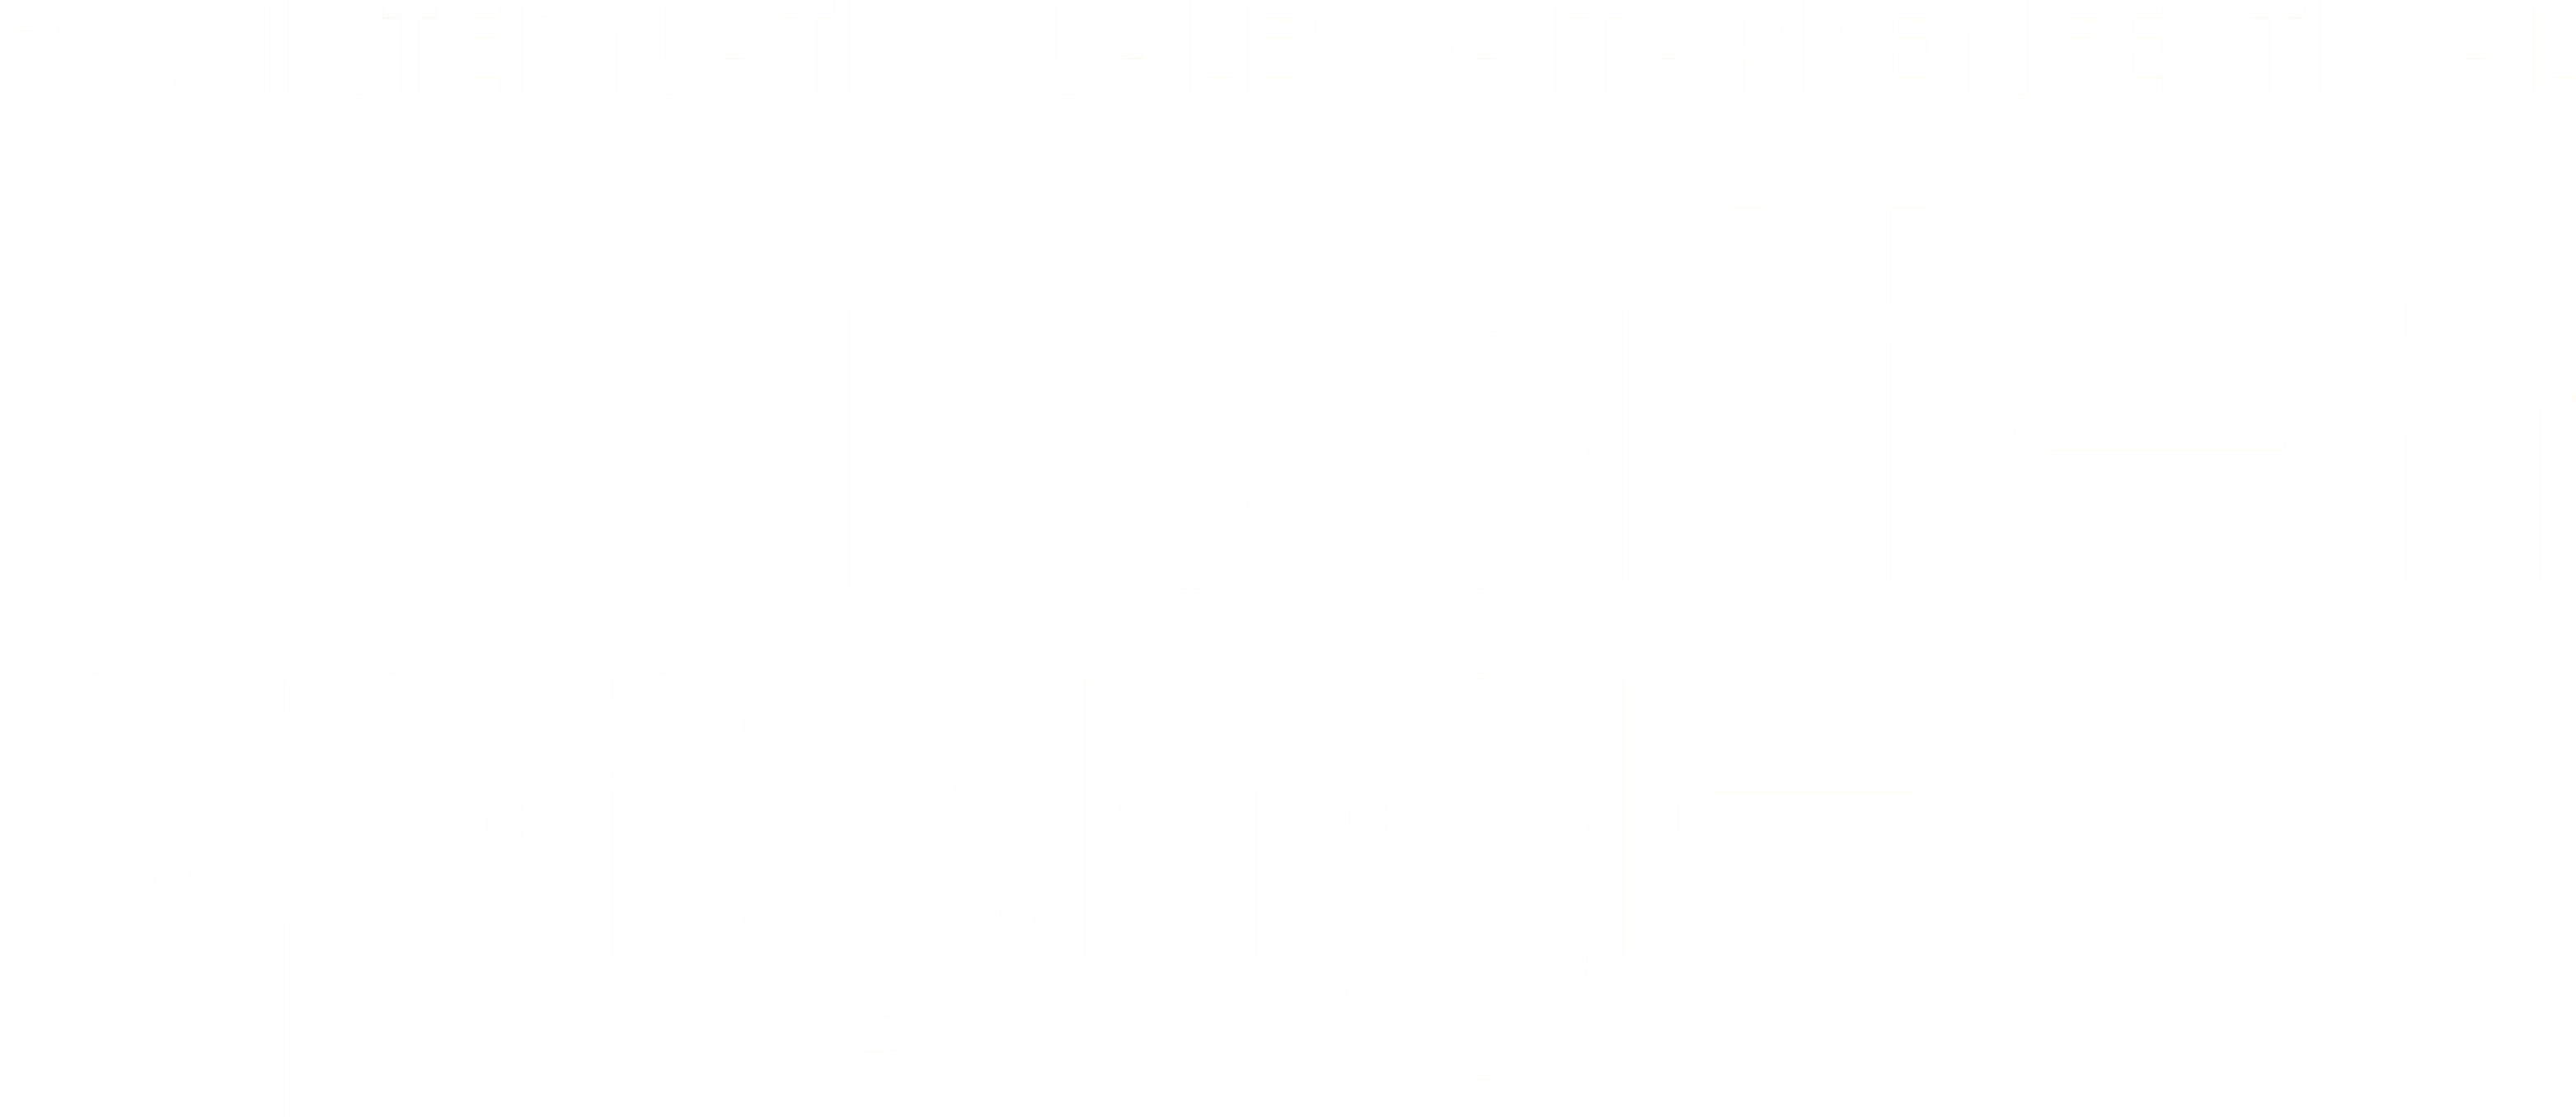 Saitensprünge - Das Gitarrenfestival in Bad-Aibling